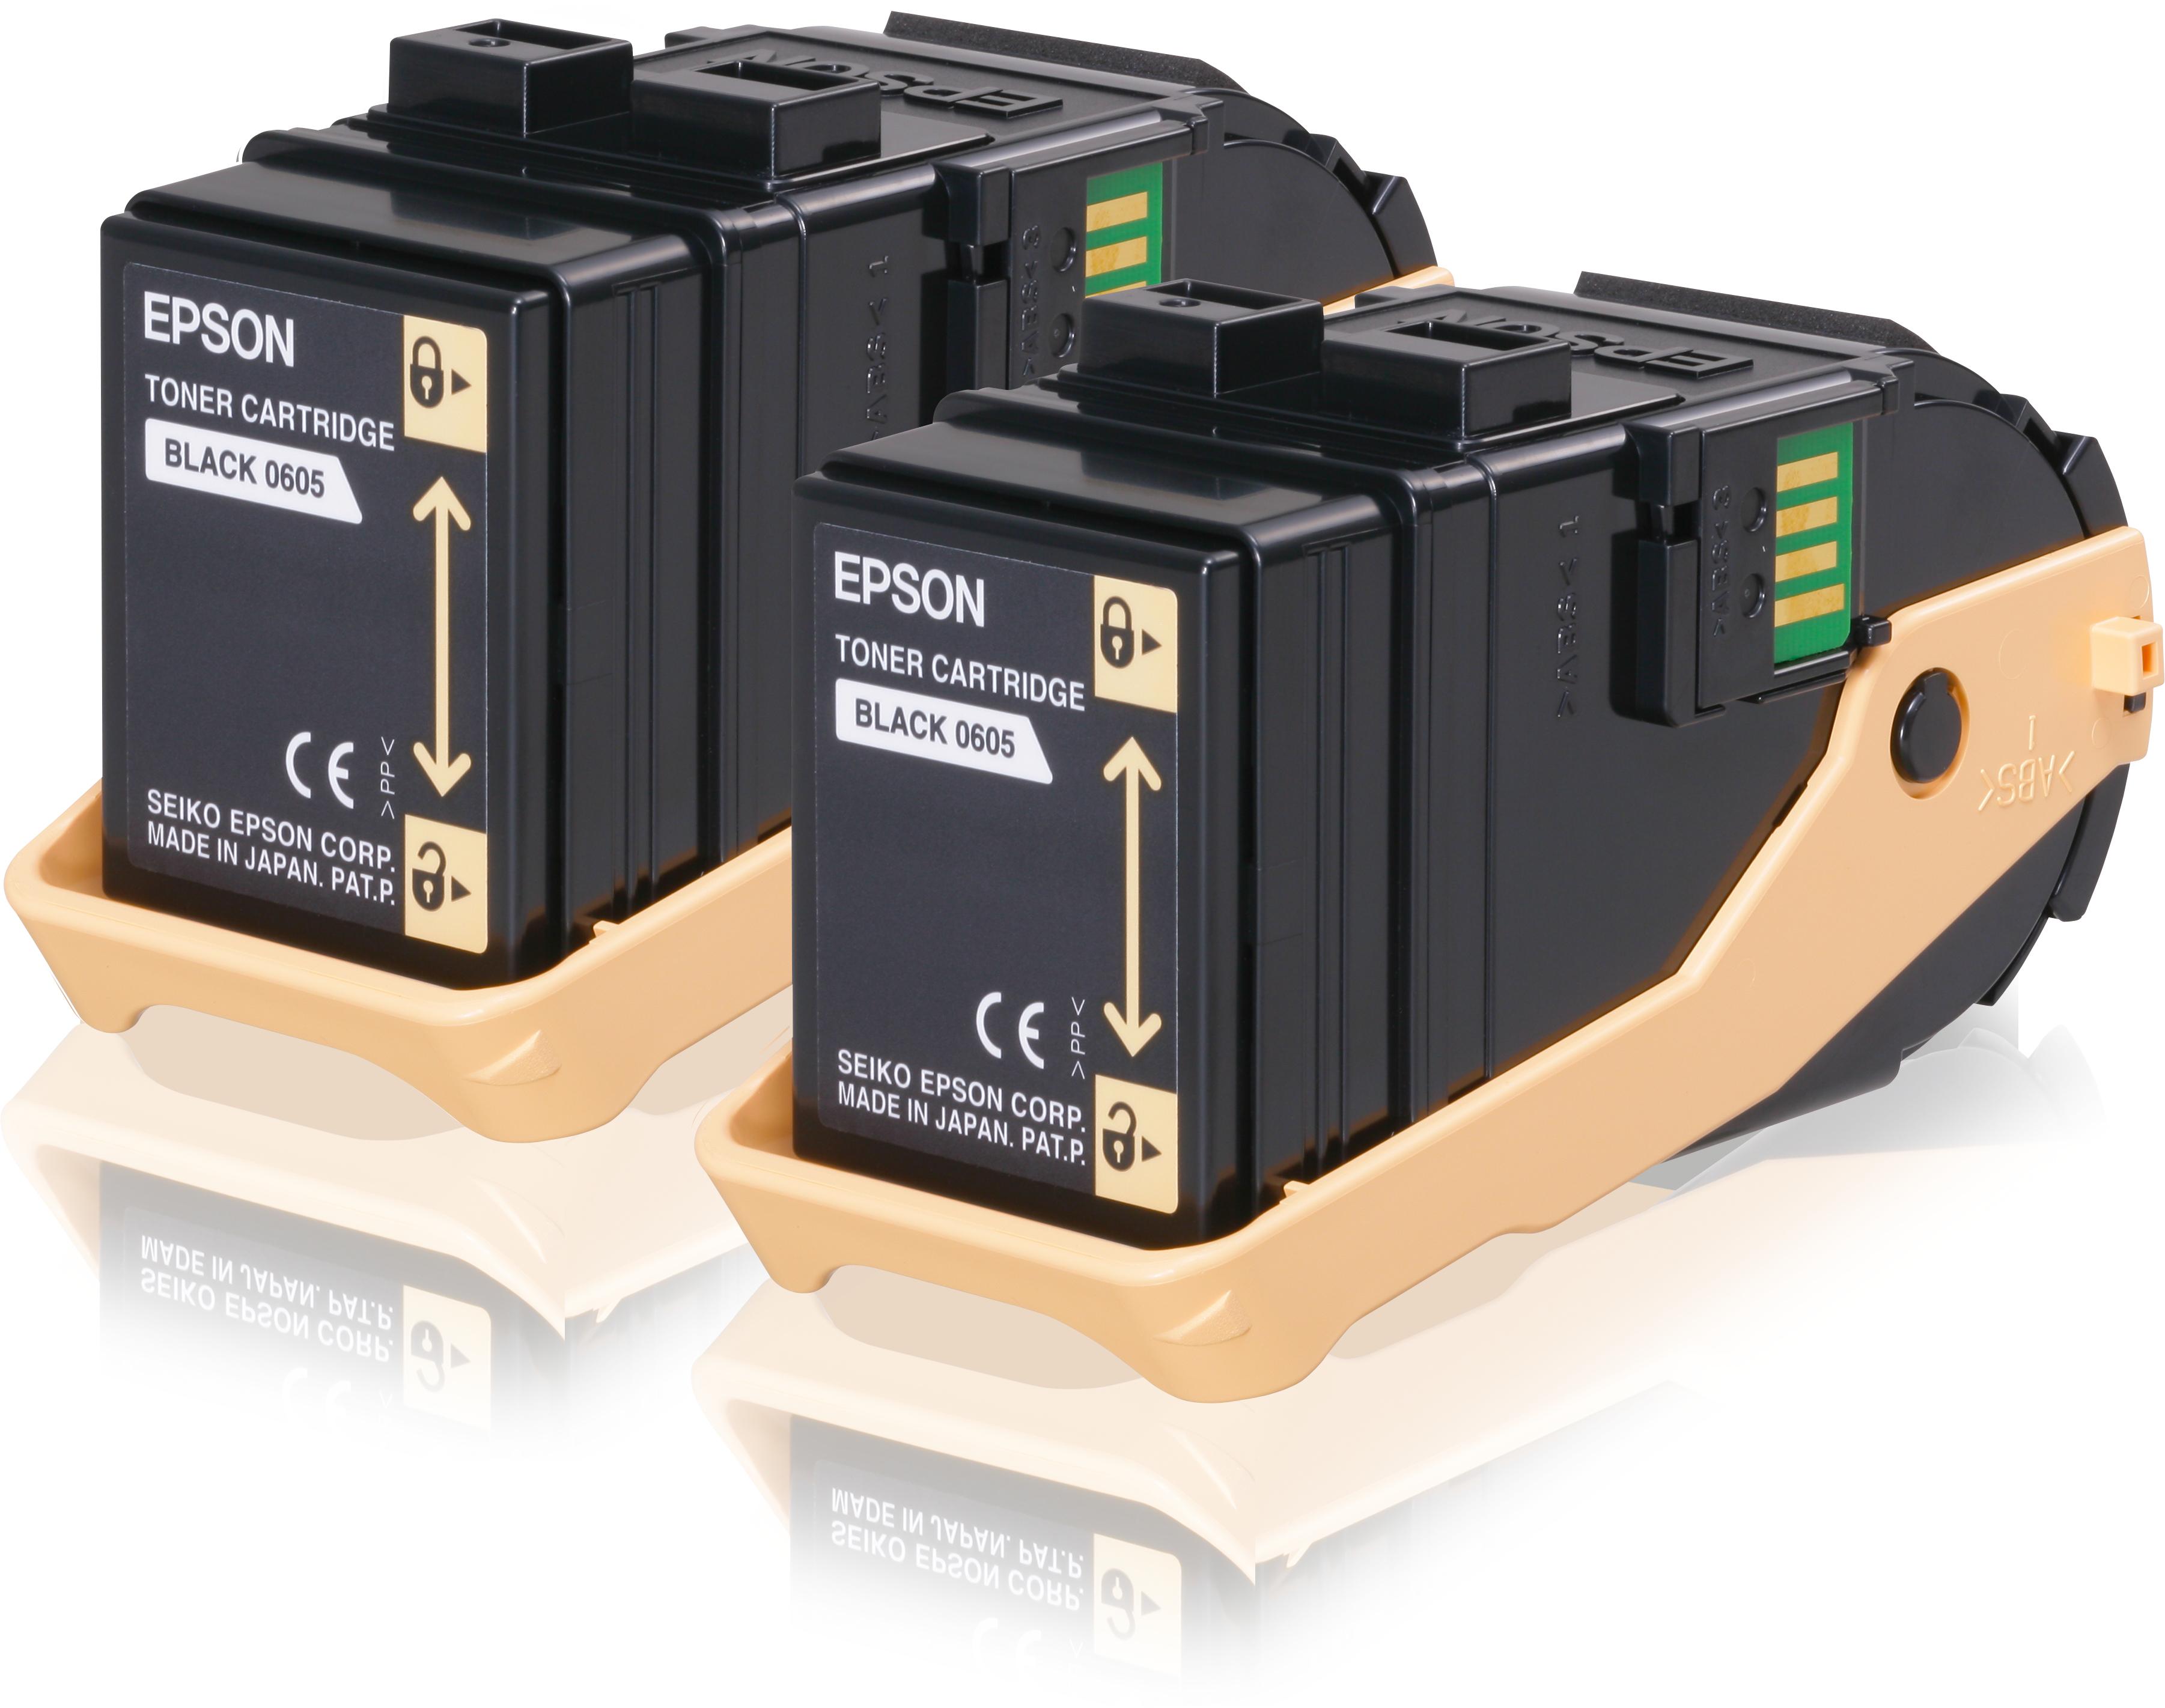 Epson-C13S050609-Double-Pack-Toner-Cartridge-Black-6-5kx2-6500-pages-Black thumbnail 2